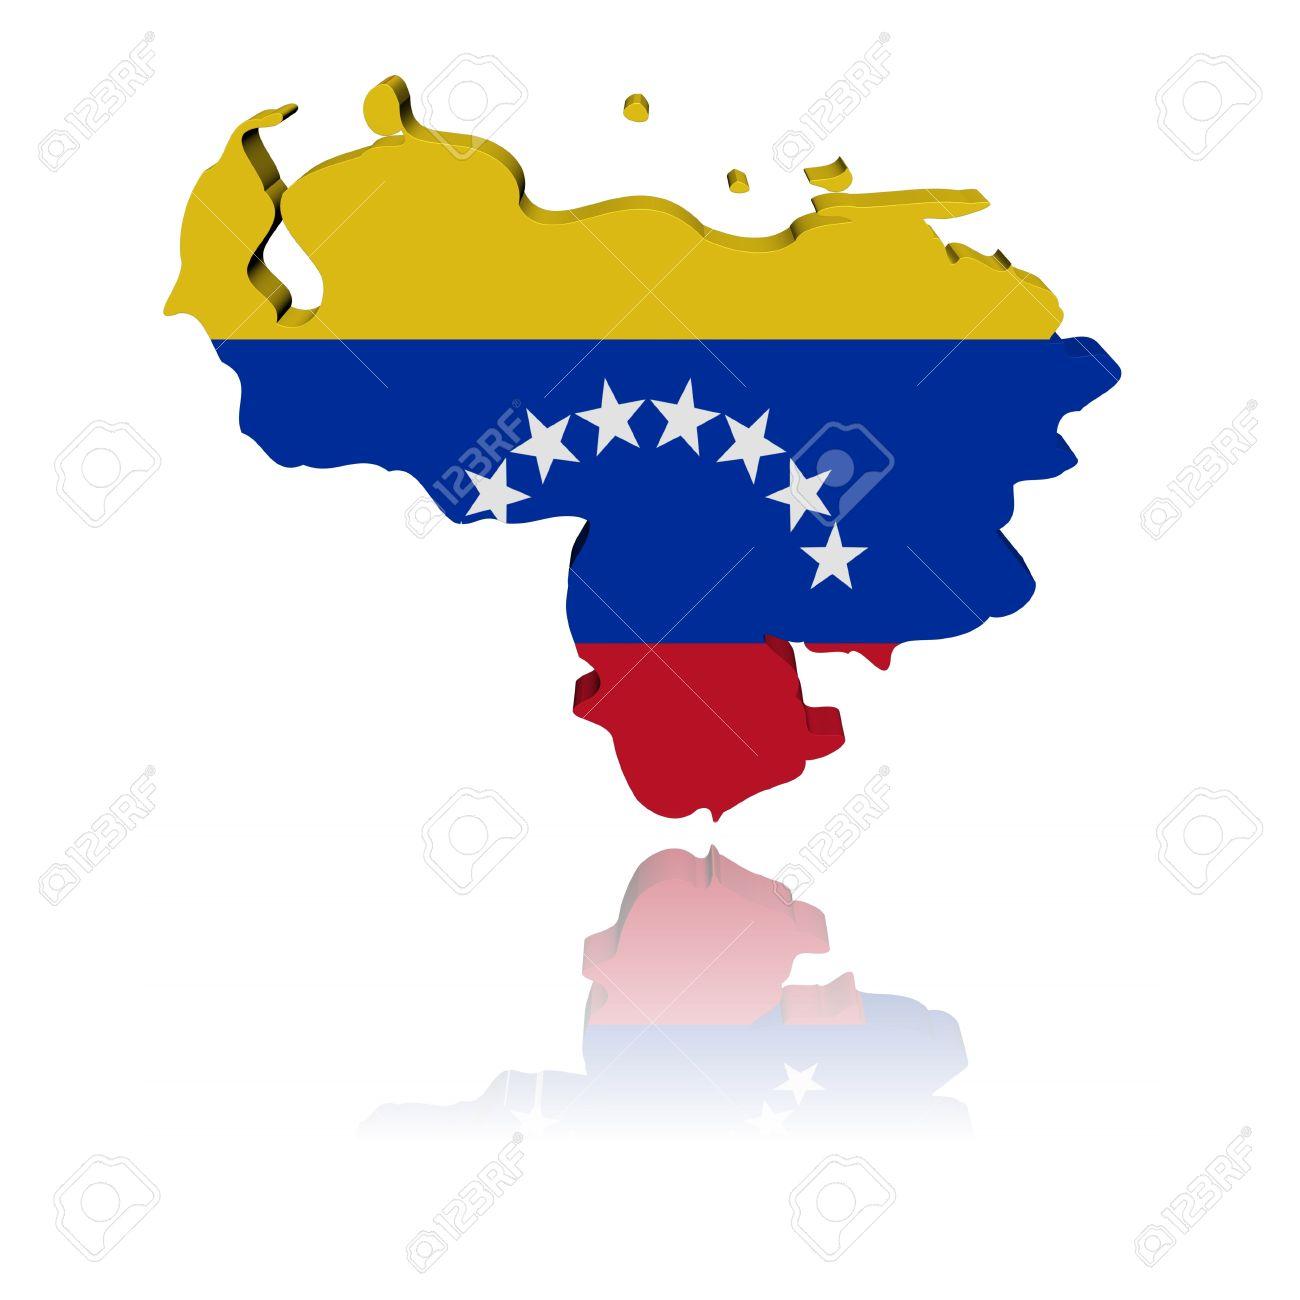 Venezuela Map Flag D Render With Reflection Illustration Stock - Venezuela map